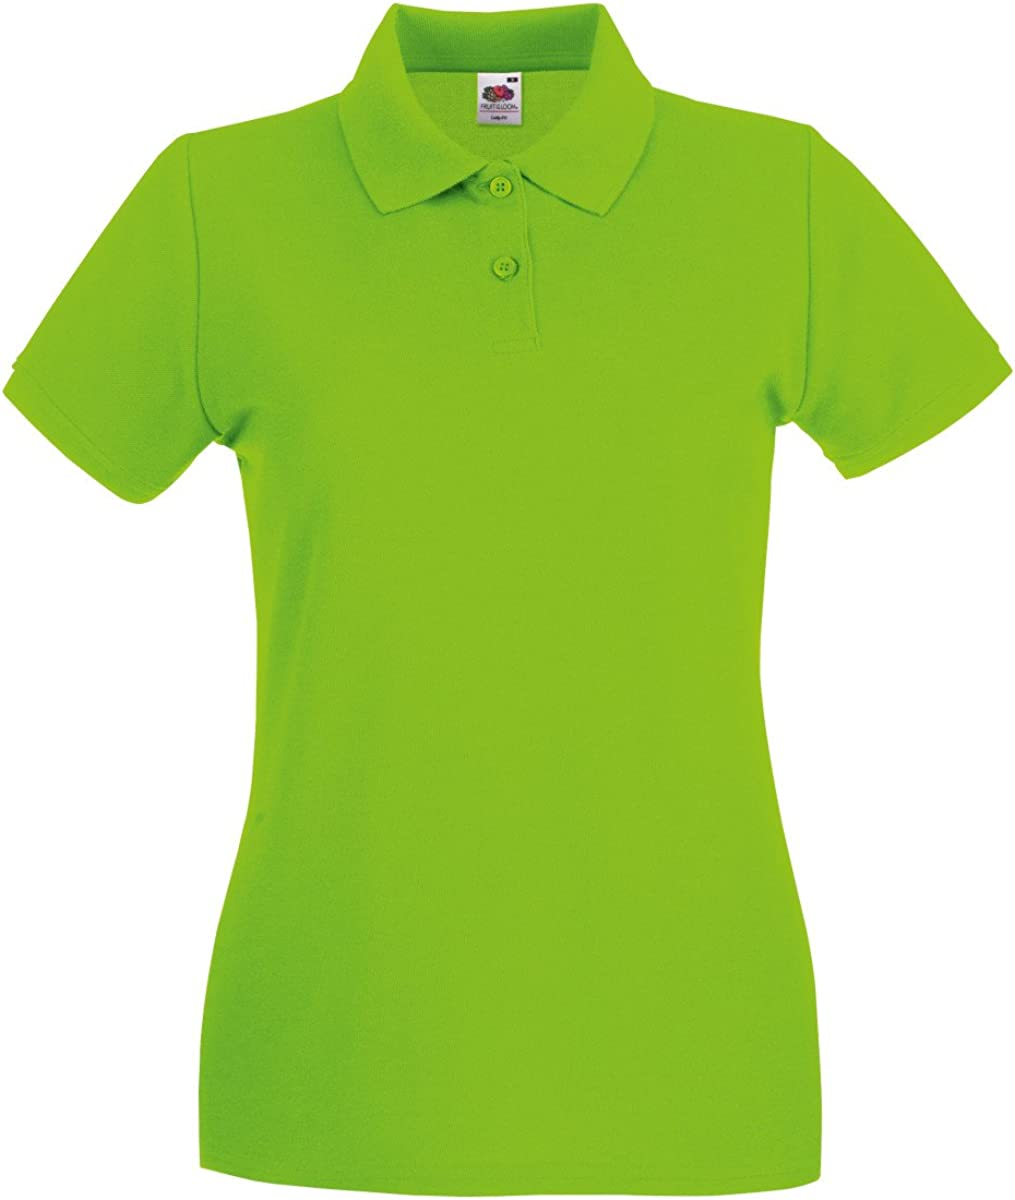 TALLA S. Camiseta tipo polo prémium de Fruit of the Loom, para mujer